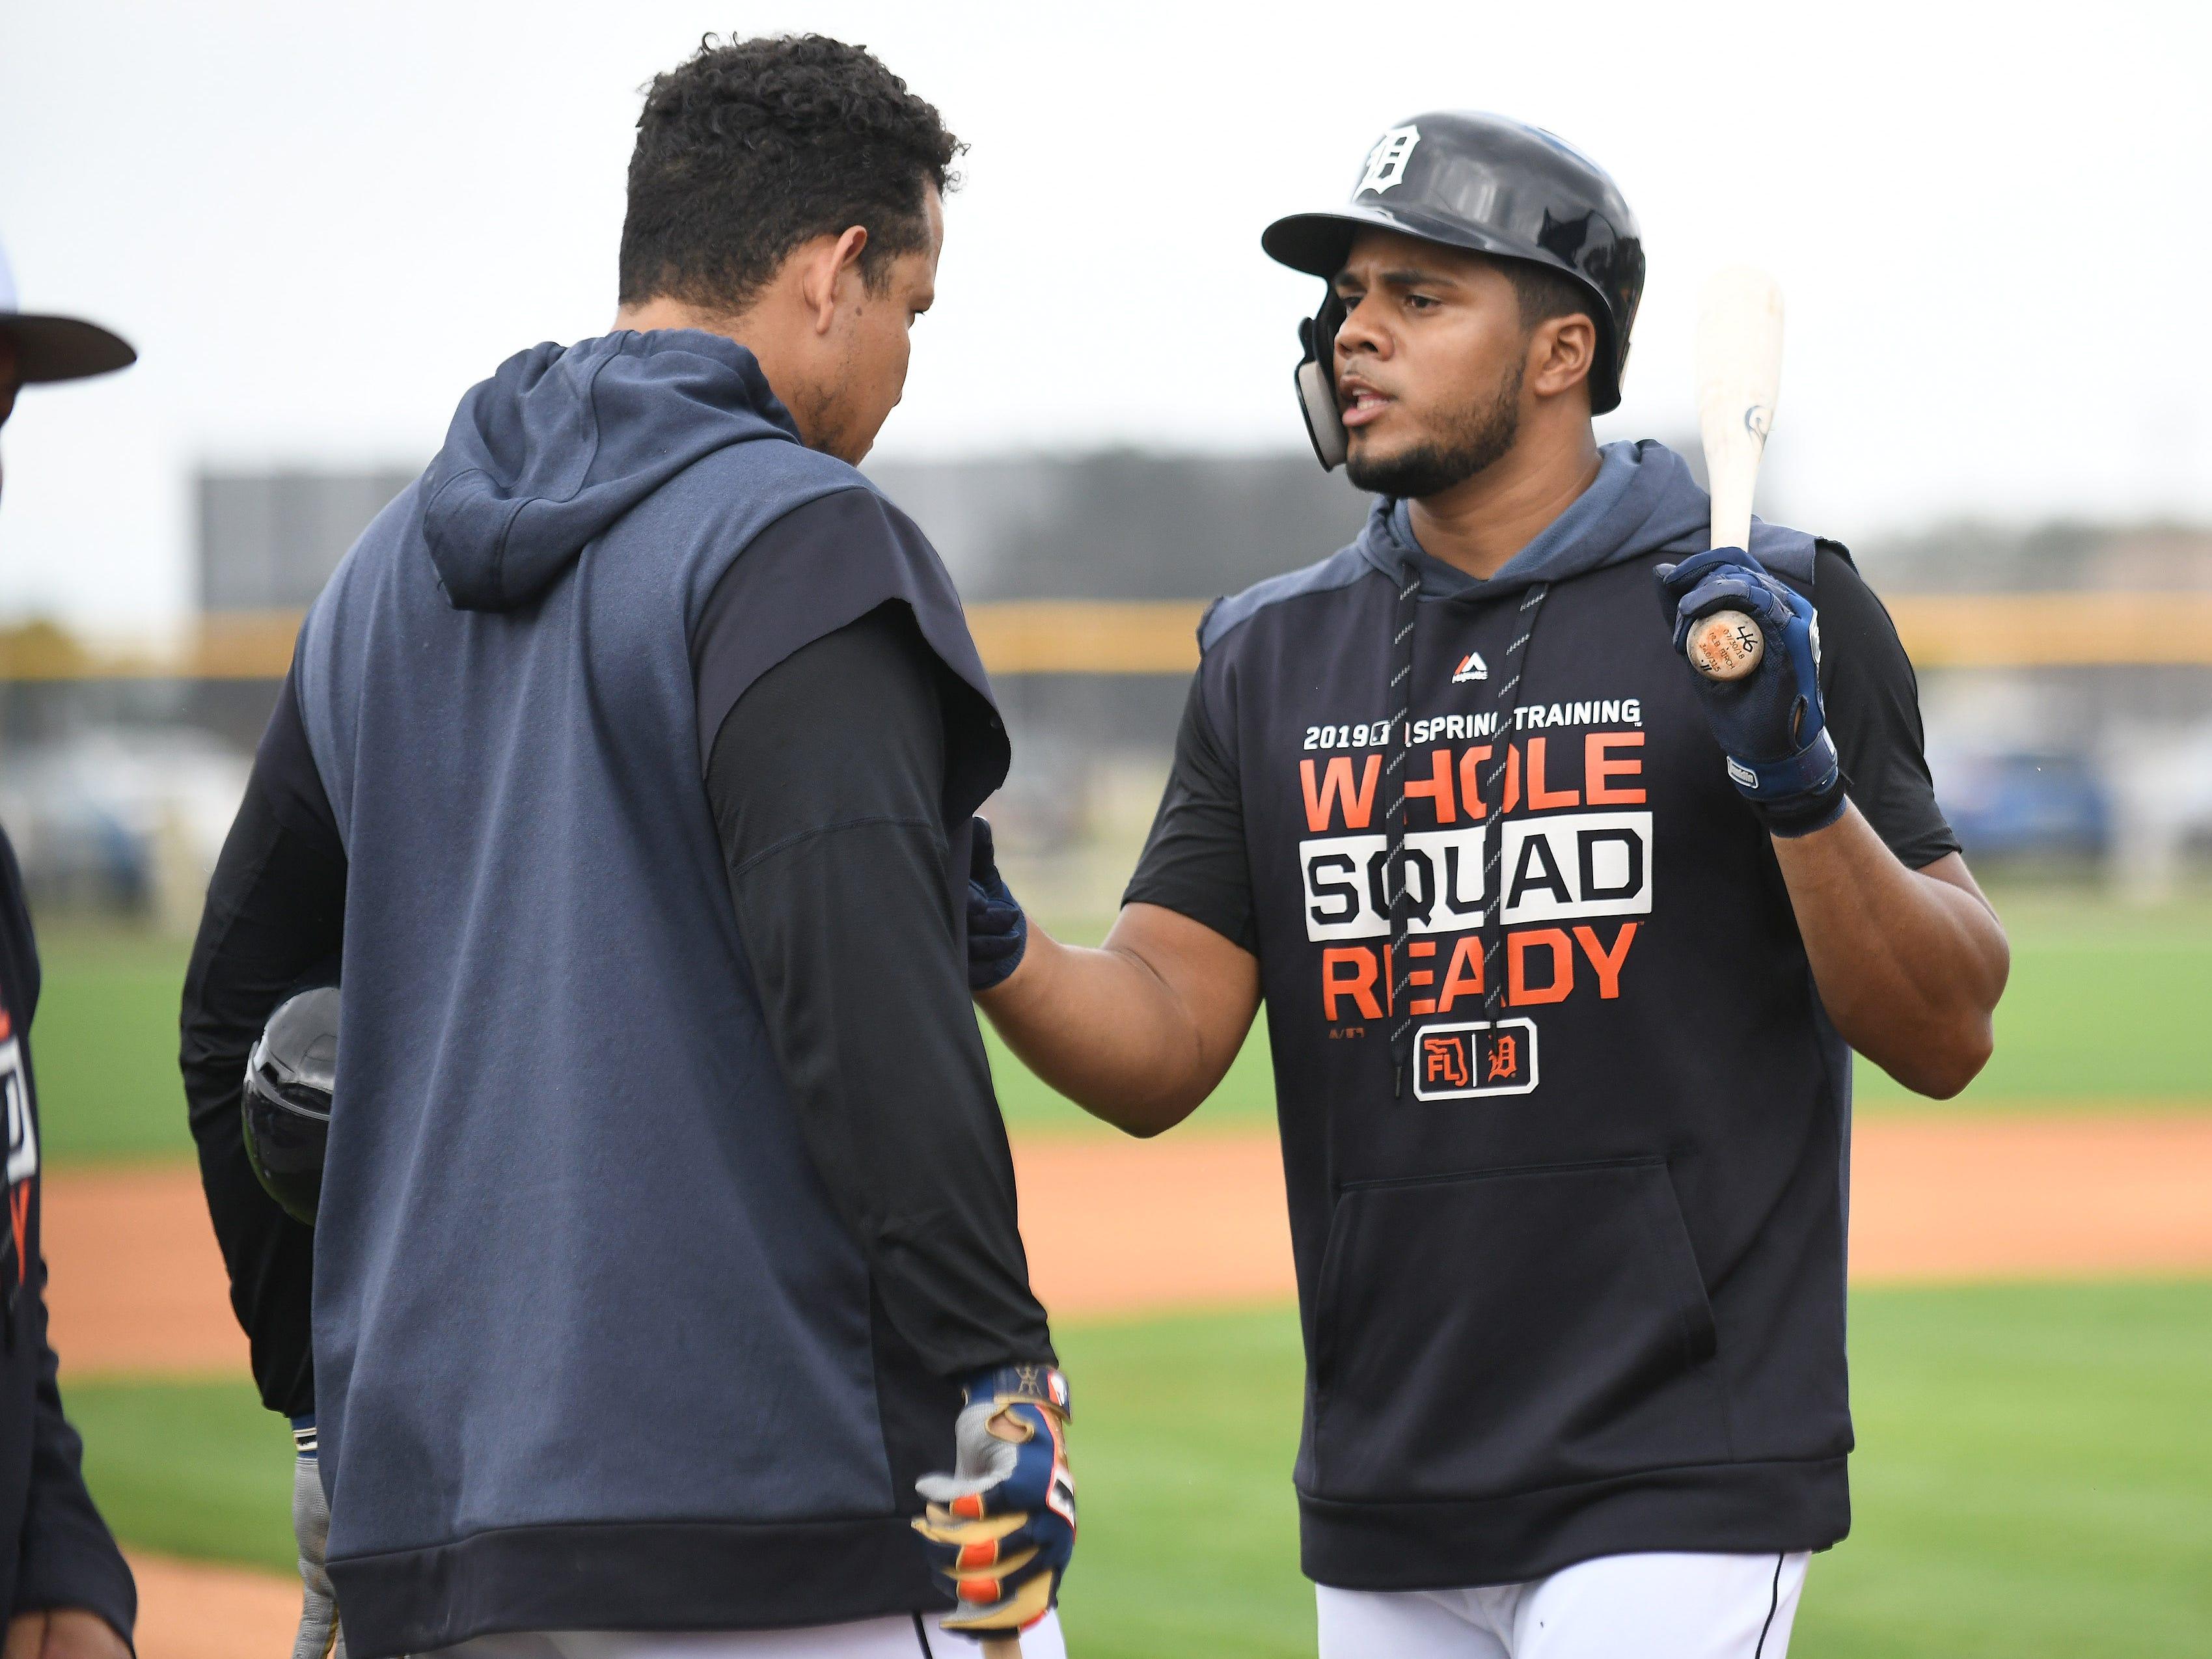 Tigers' Jeimer Candelario and Miguel Cabrera, left, talk between turns at batting practice.